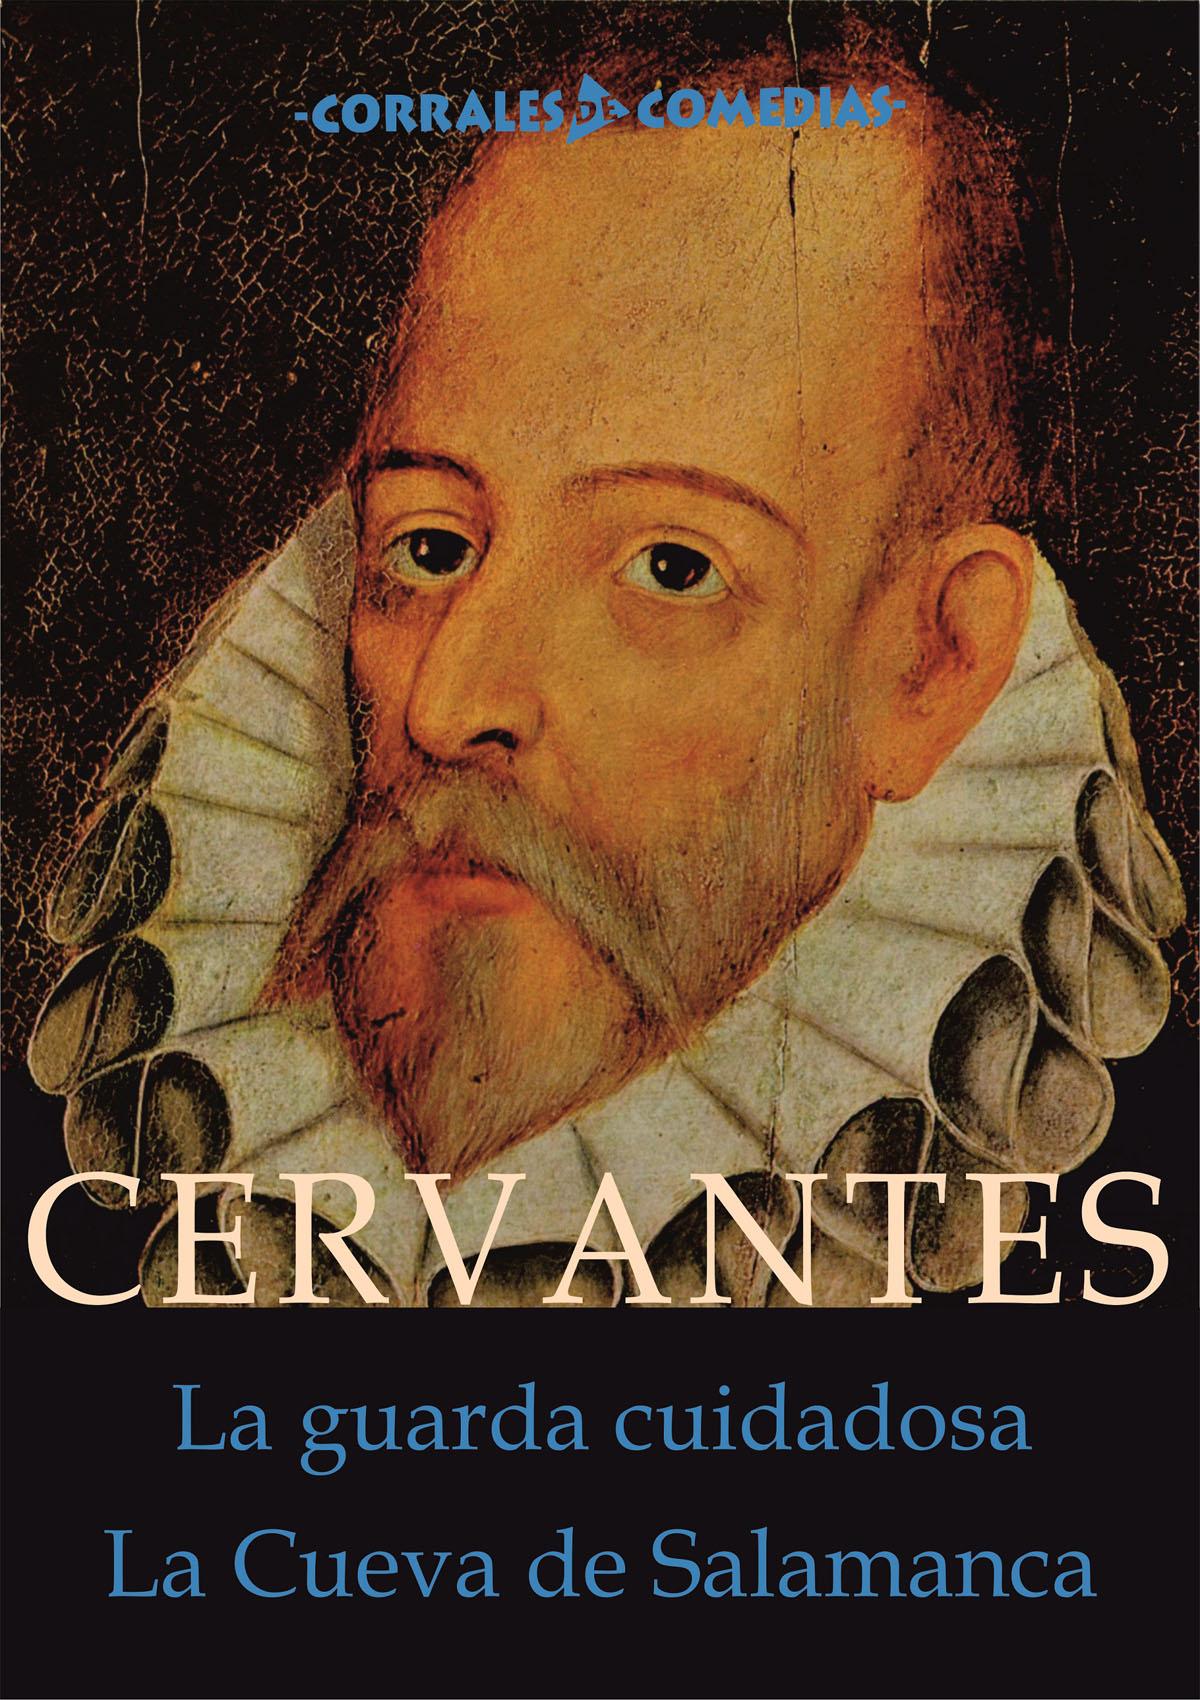 Teatro. Corral de Comedias (Entremeses de Cervantes)